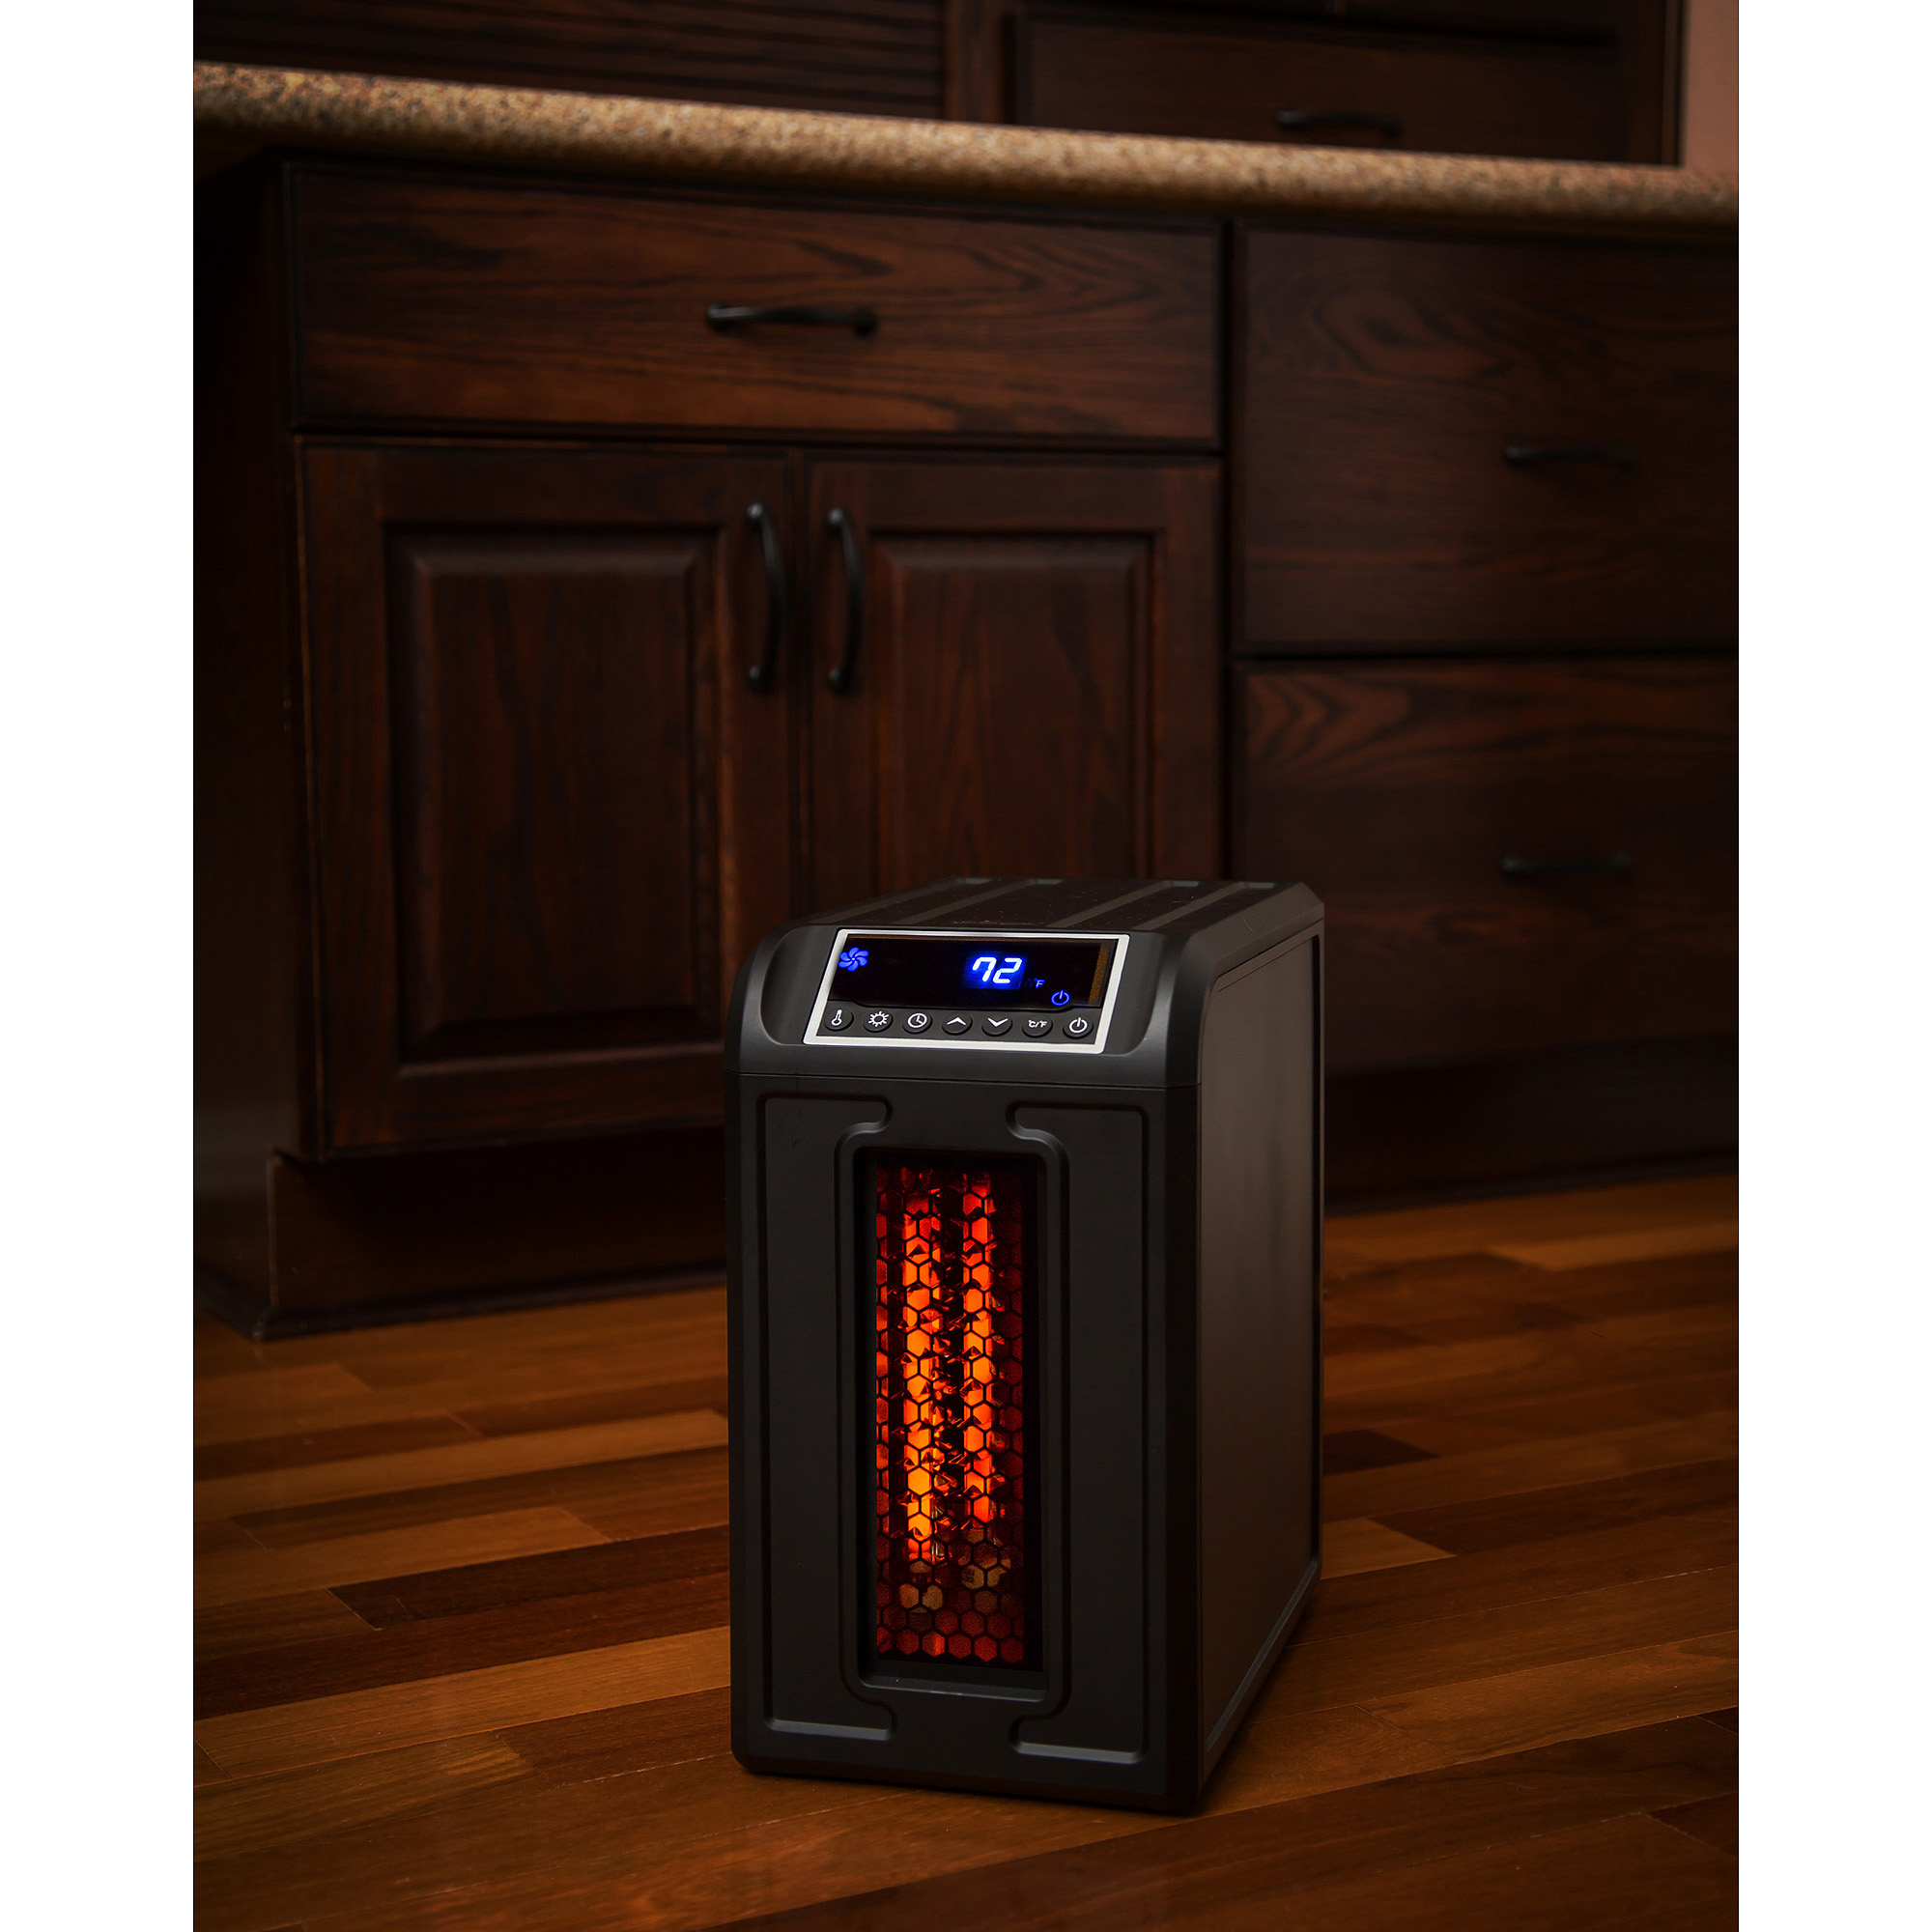 LifeSmart 800 sq ft 3 Infrared Heater